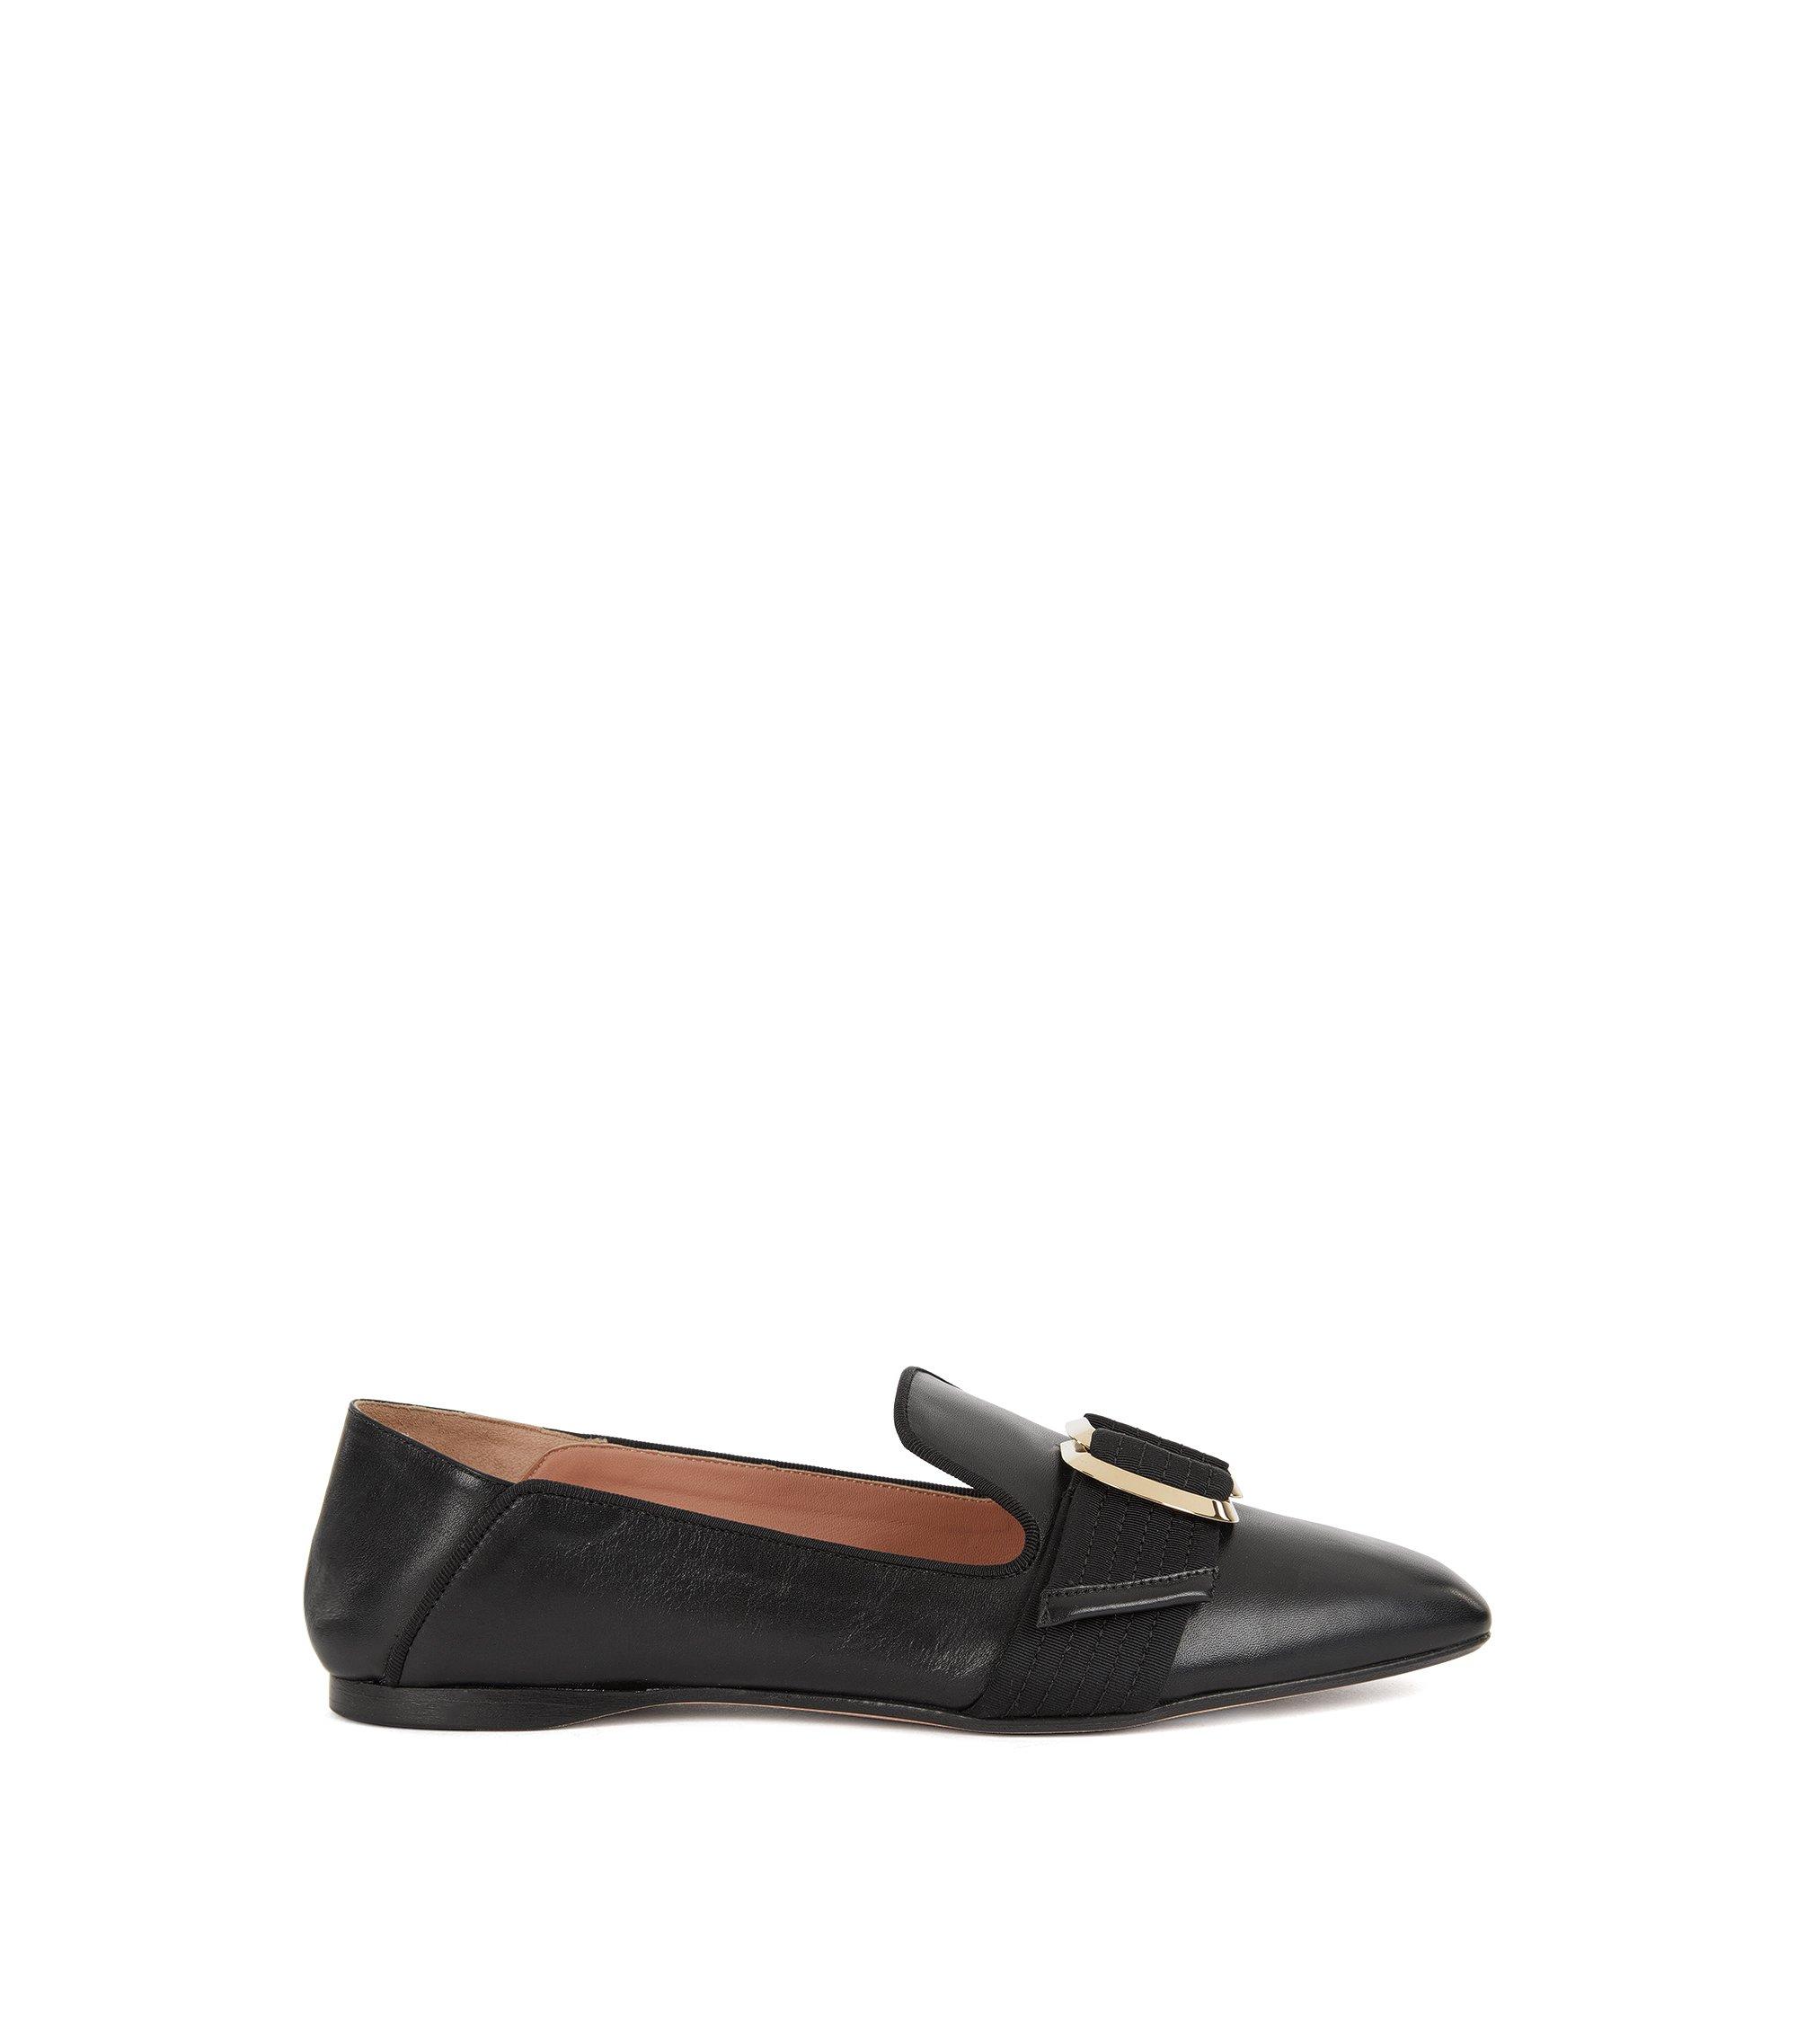 Loafer aus Leder mit Doppelring-Detail, Schwarz